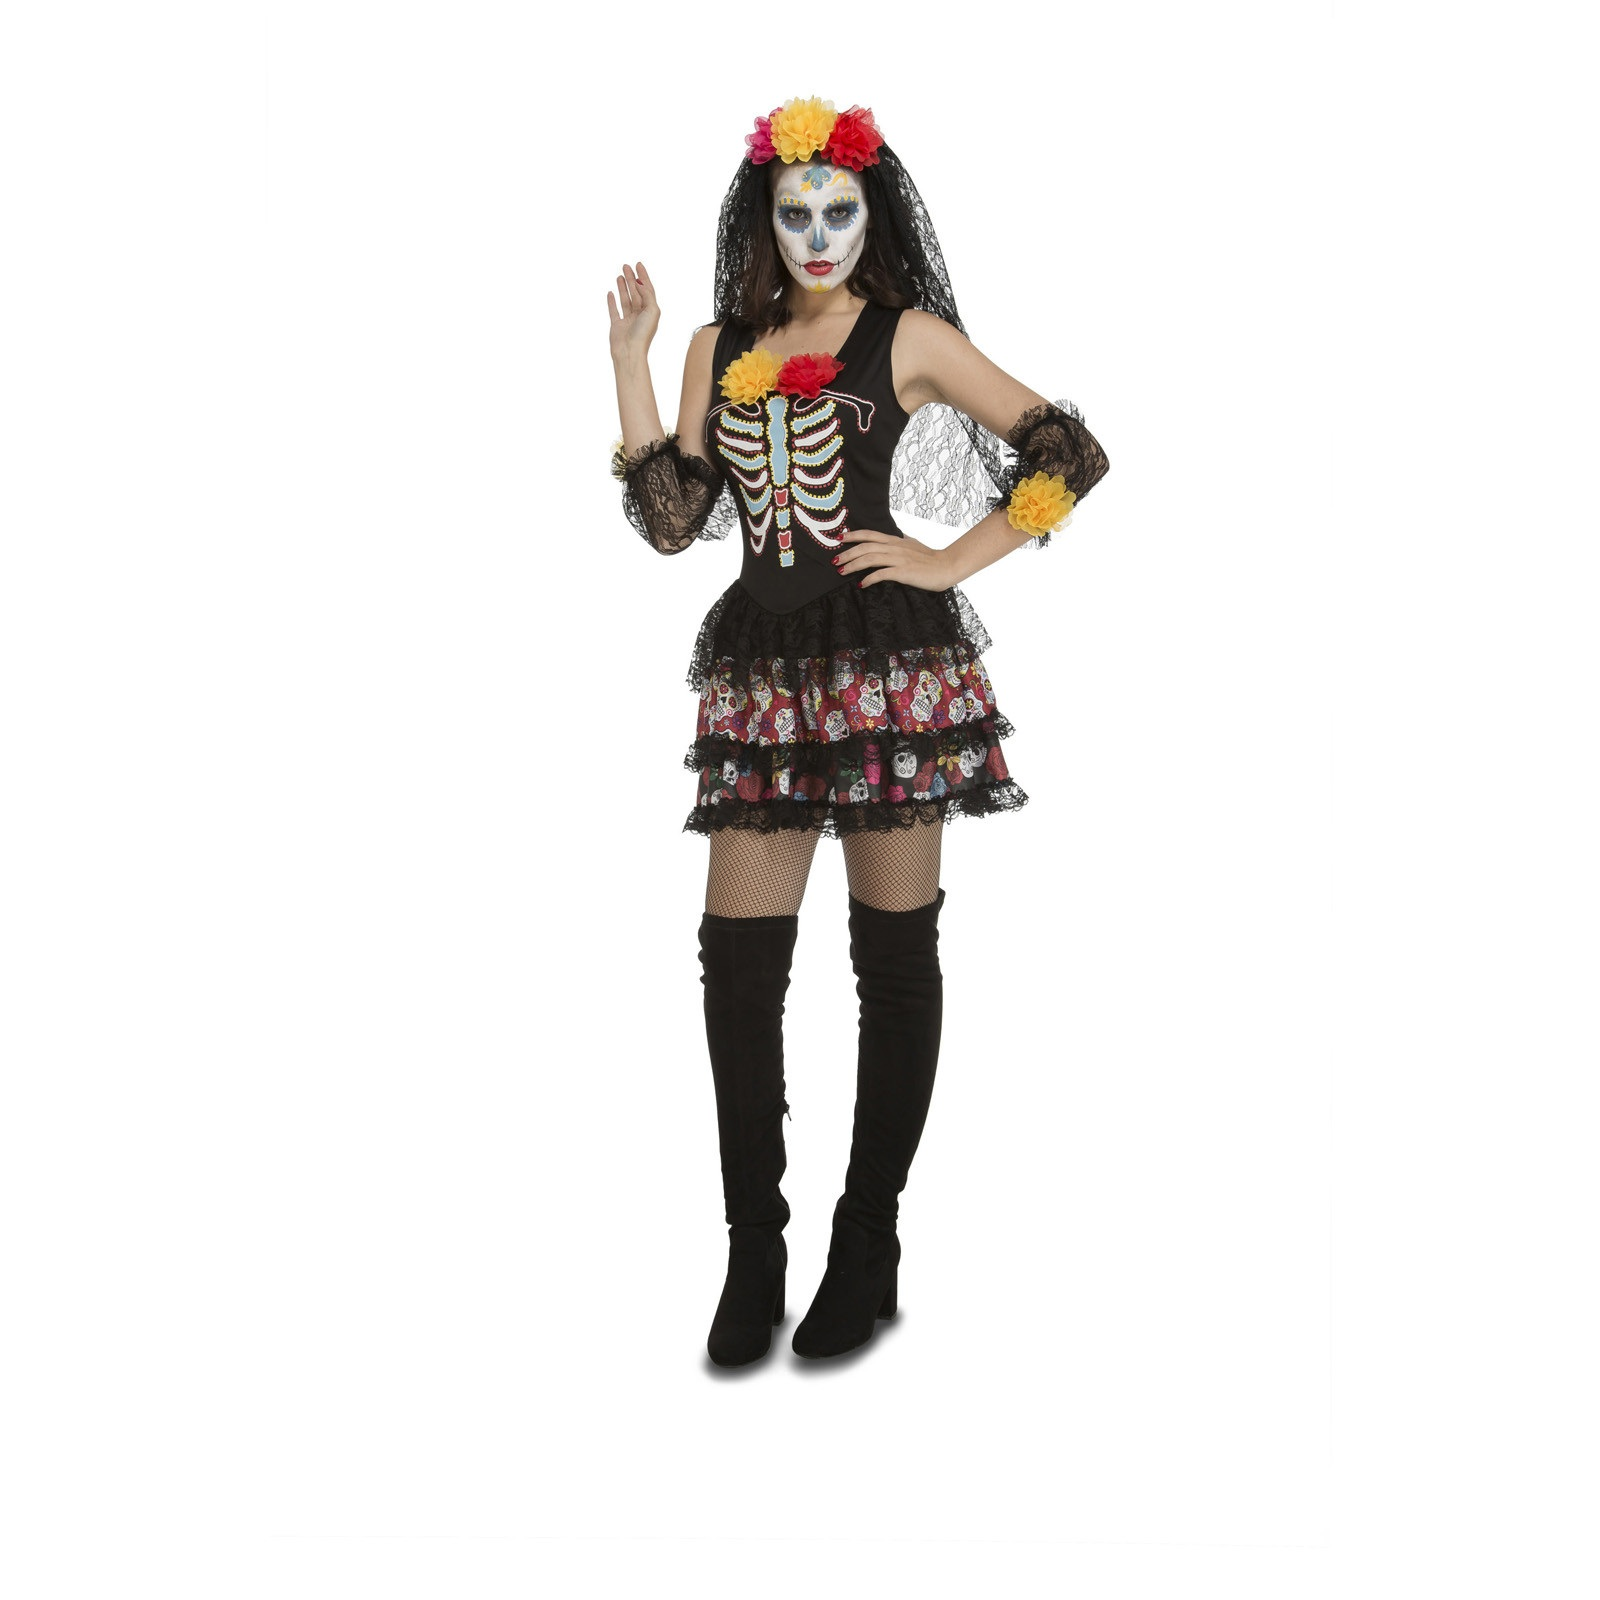 disfraz sugarskull mujer - DISFRAZ DE SUGAR SKULL MUJER